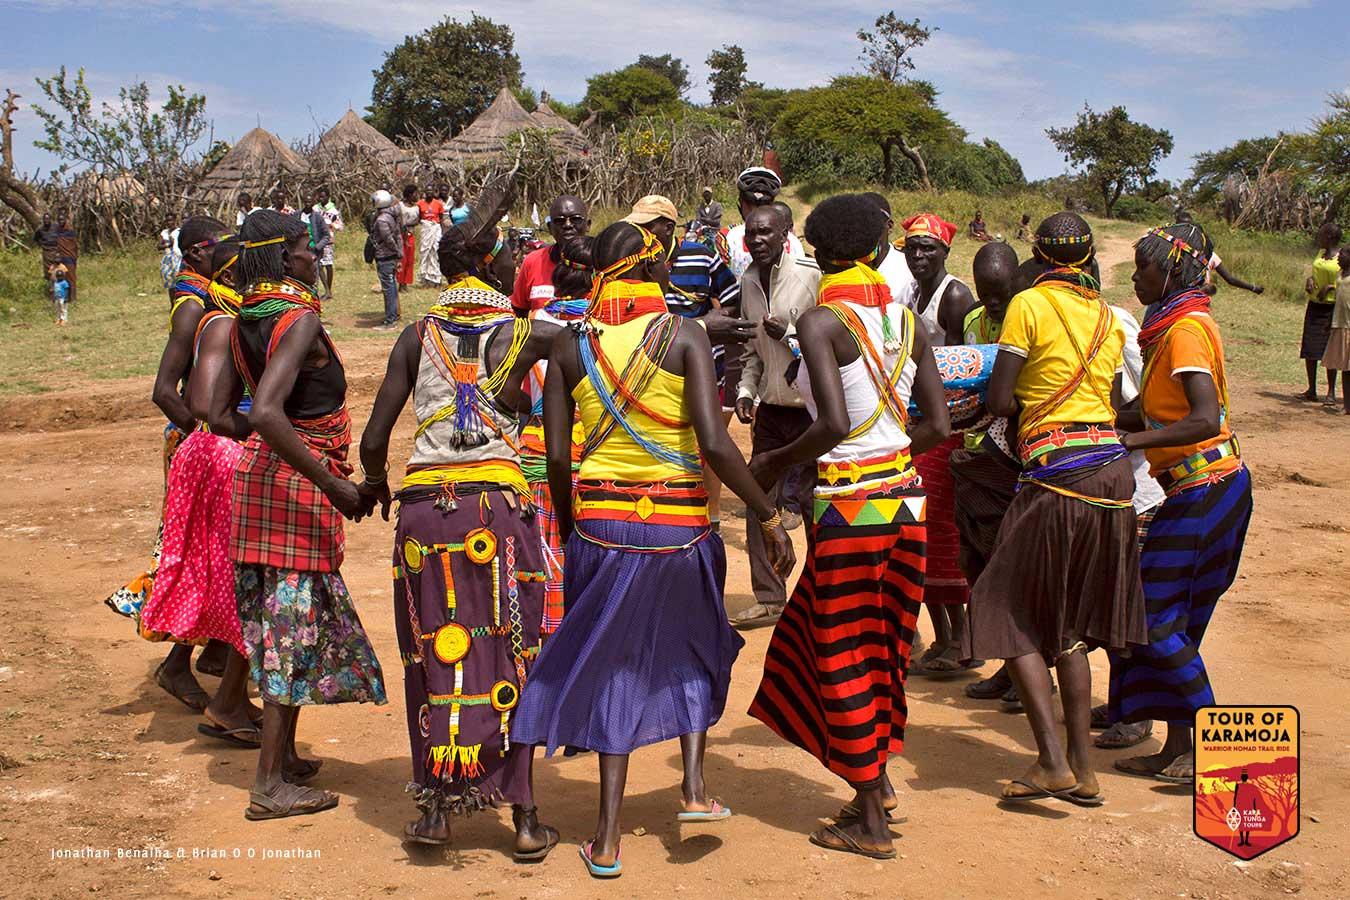 kara-tunga-tour-of-karamoja-2020-uganda-warrior-nomad-trail-bike-event-timu-ik